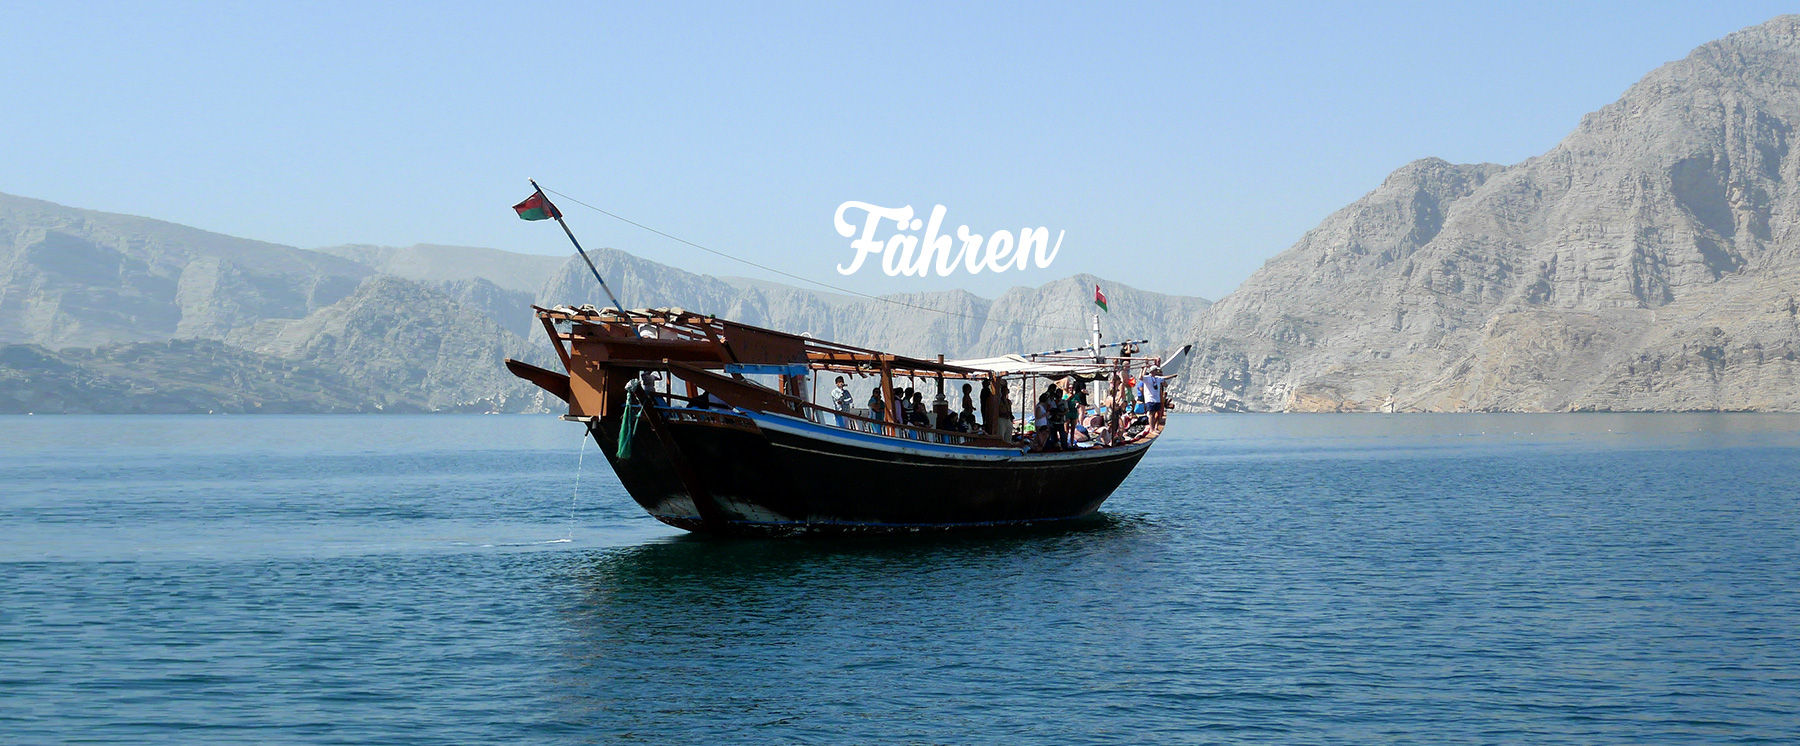 Fähren